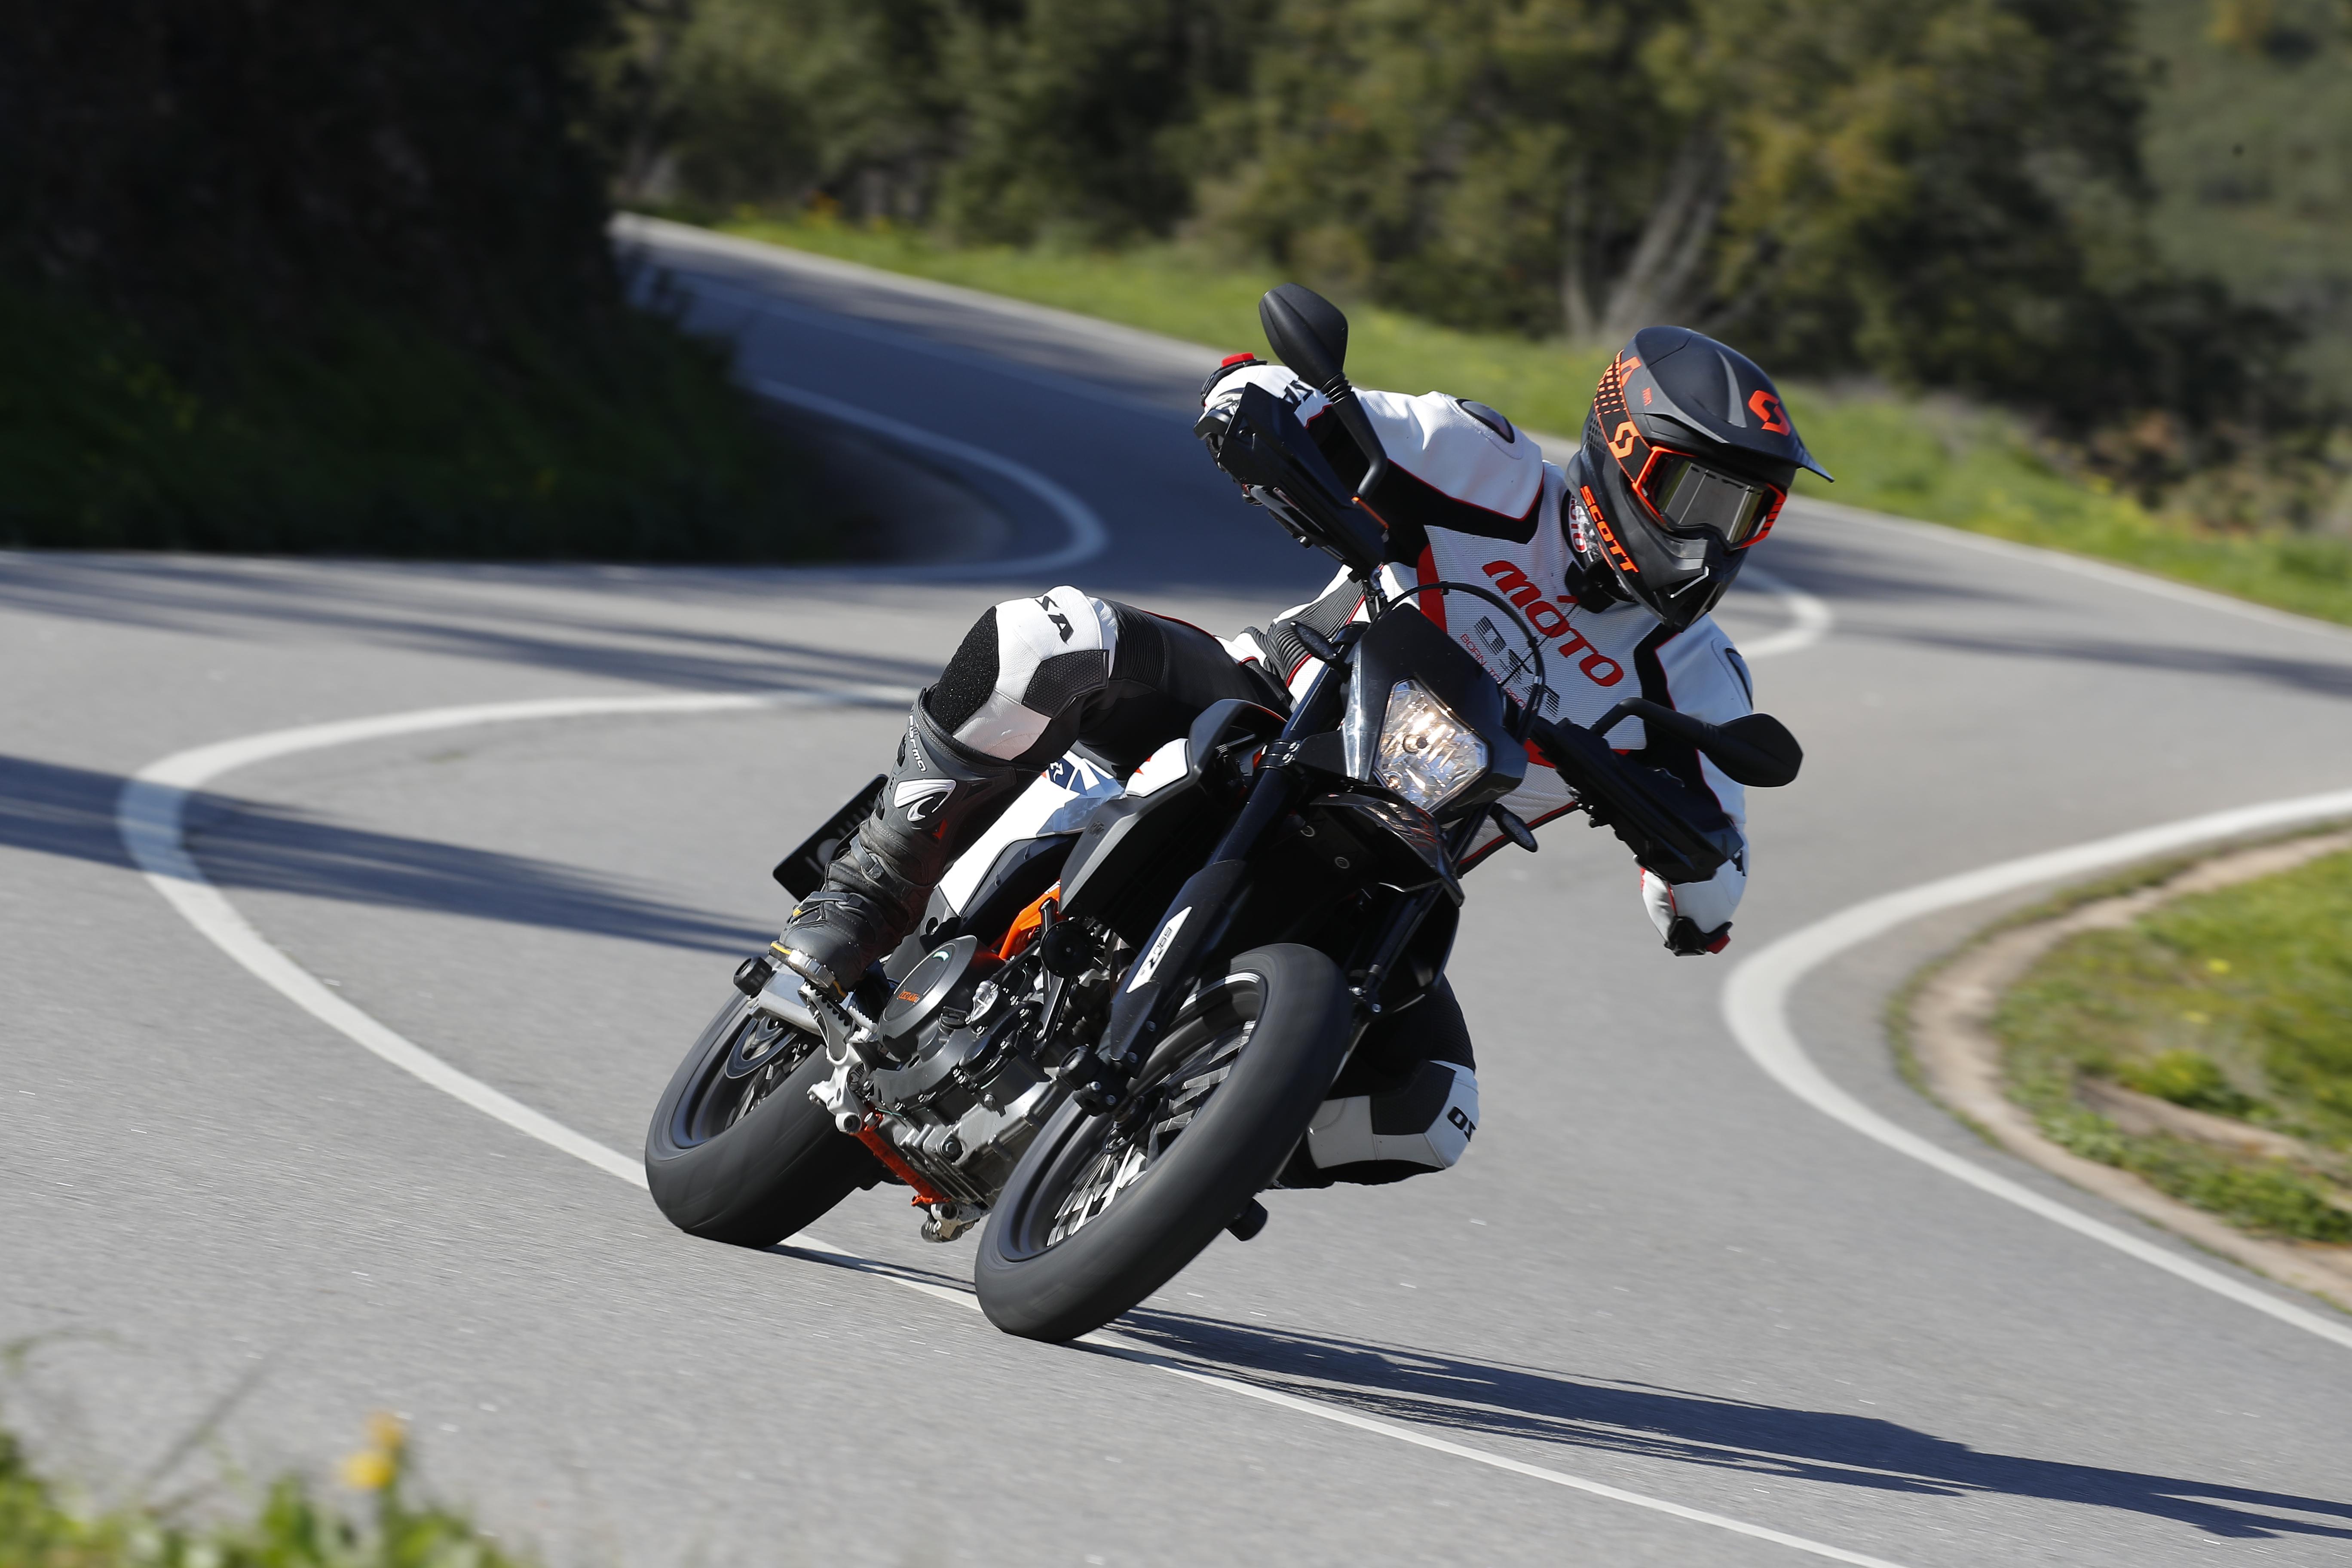 Тест KTM 690 Enduro R и 690 SMC R